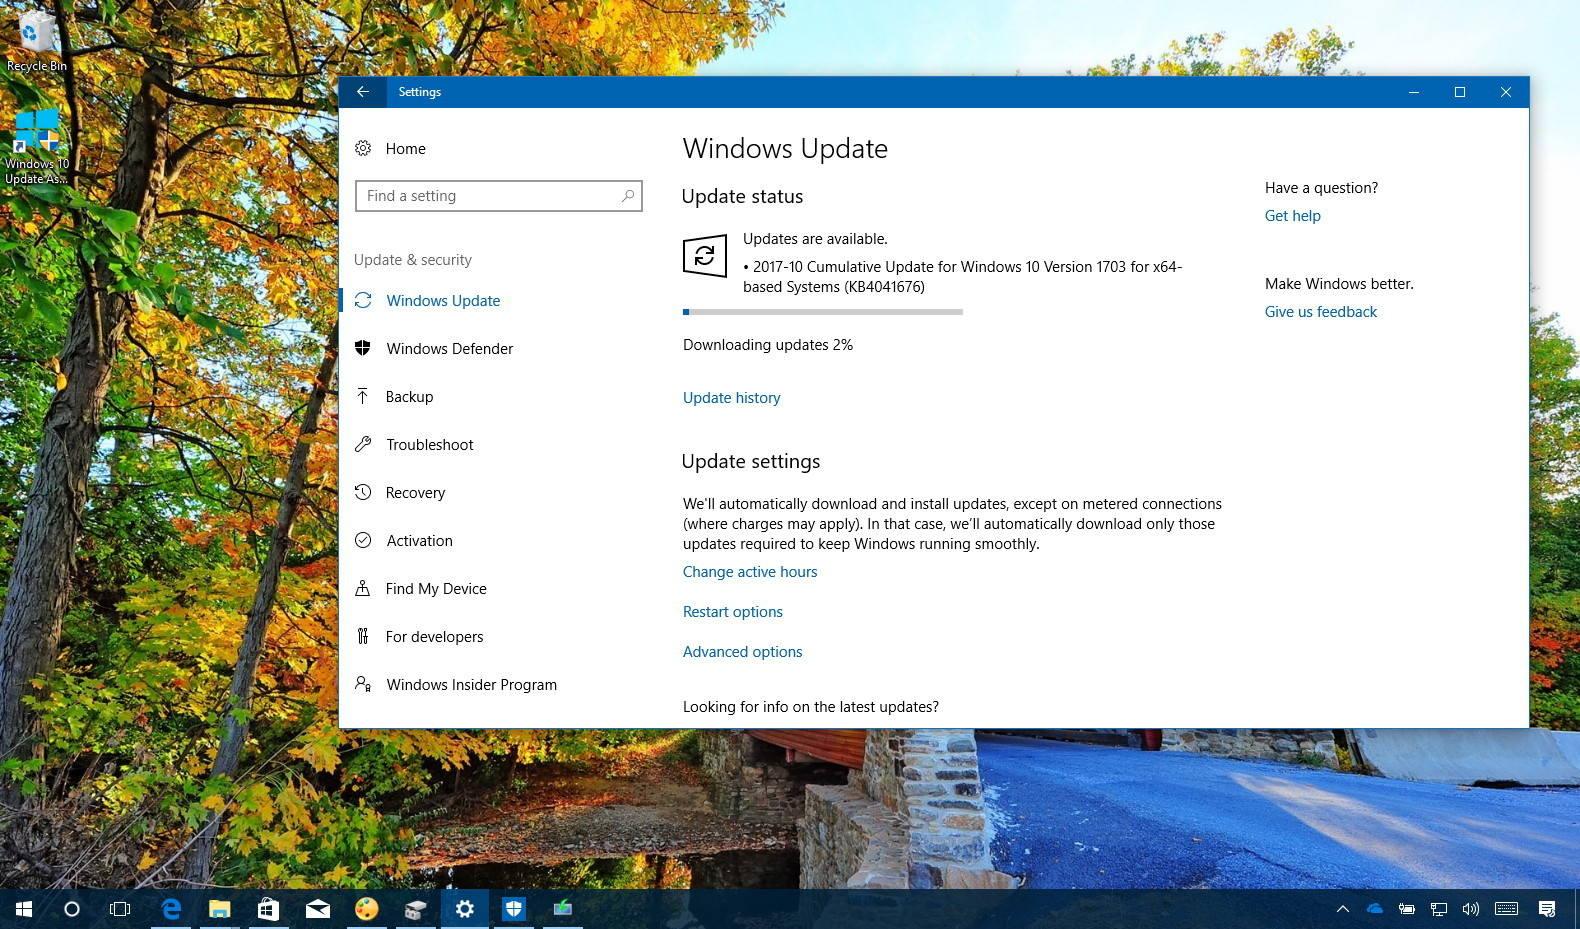 Windows 10 update KB4041676